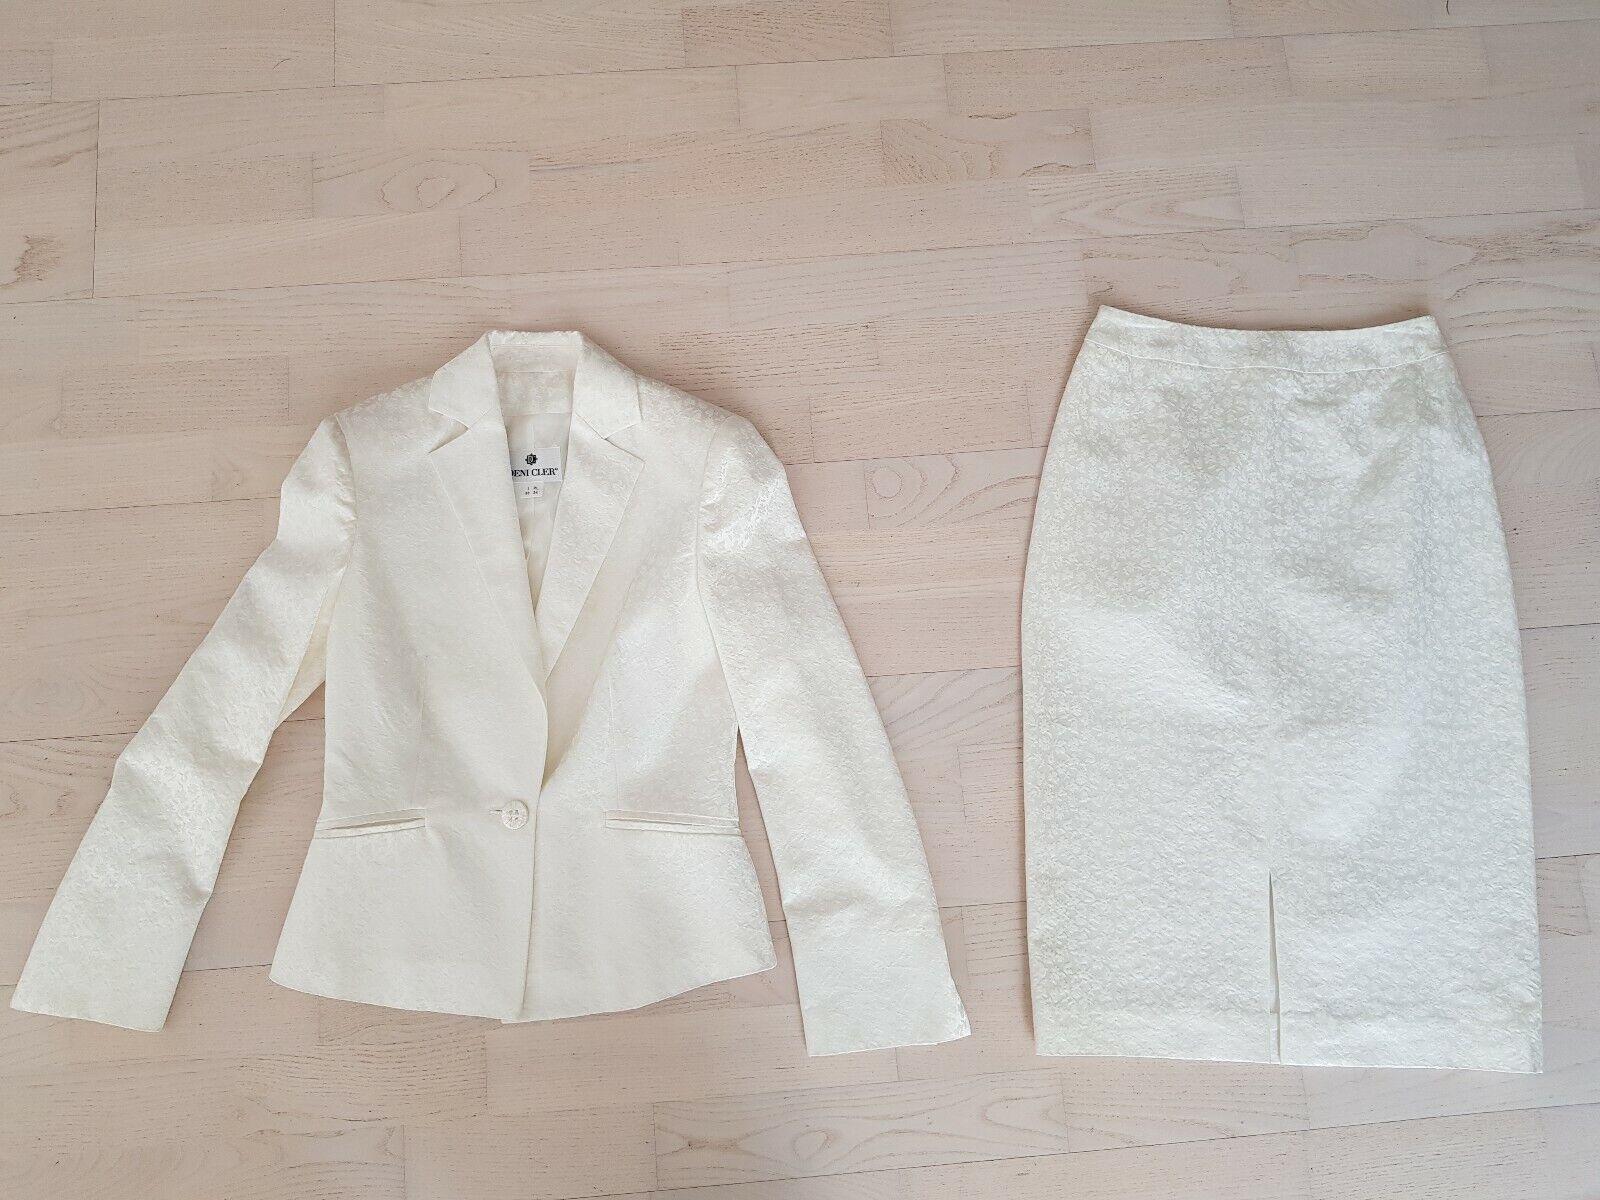 Deni options Jacquard Costume Costume Rock 34 it38 Offblanc